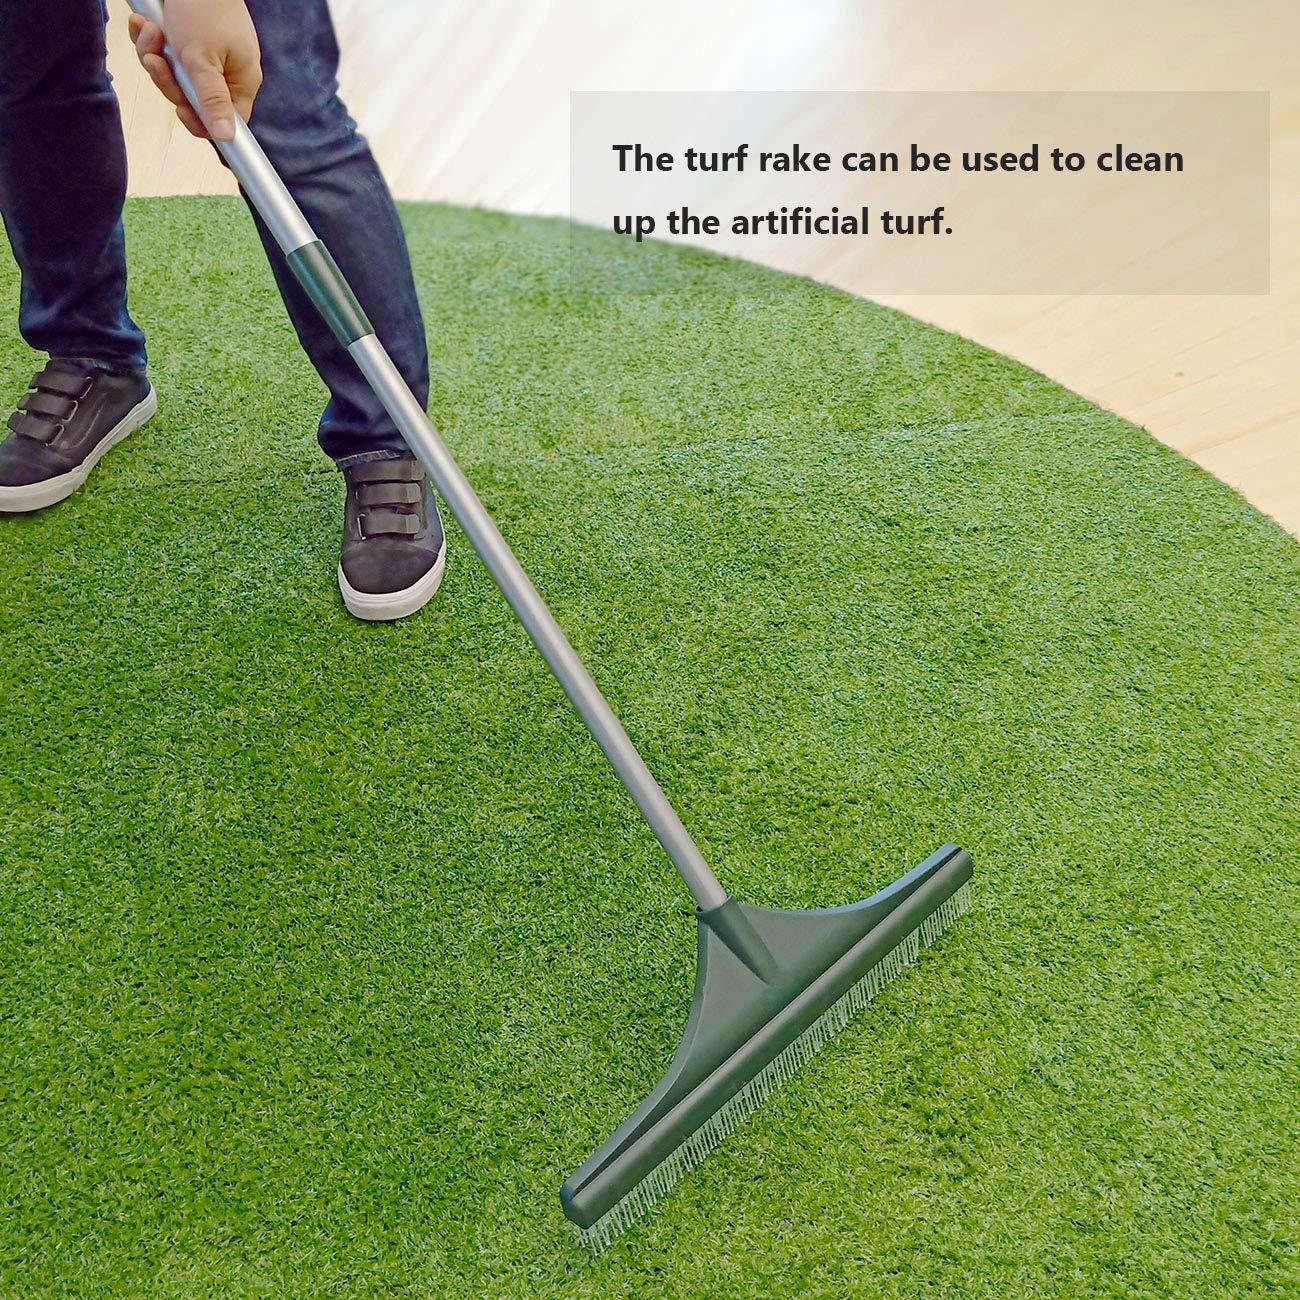 ORIENTOOLS Turf Rake, Ergonomic Adjustable Lightweight Steel Handle, Plastic Head PA brush, 32 to 52 inches, Carpet Rake by ORIENTOOLS (Image #6)